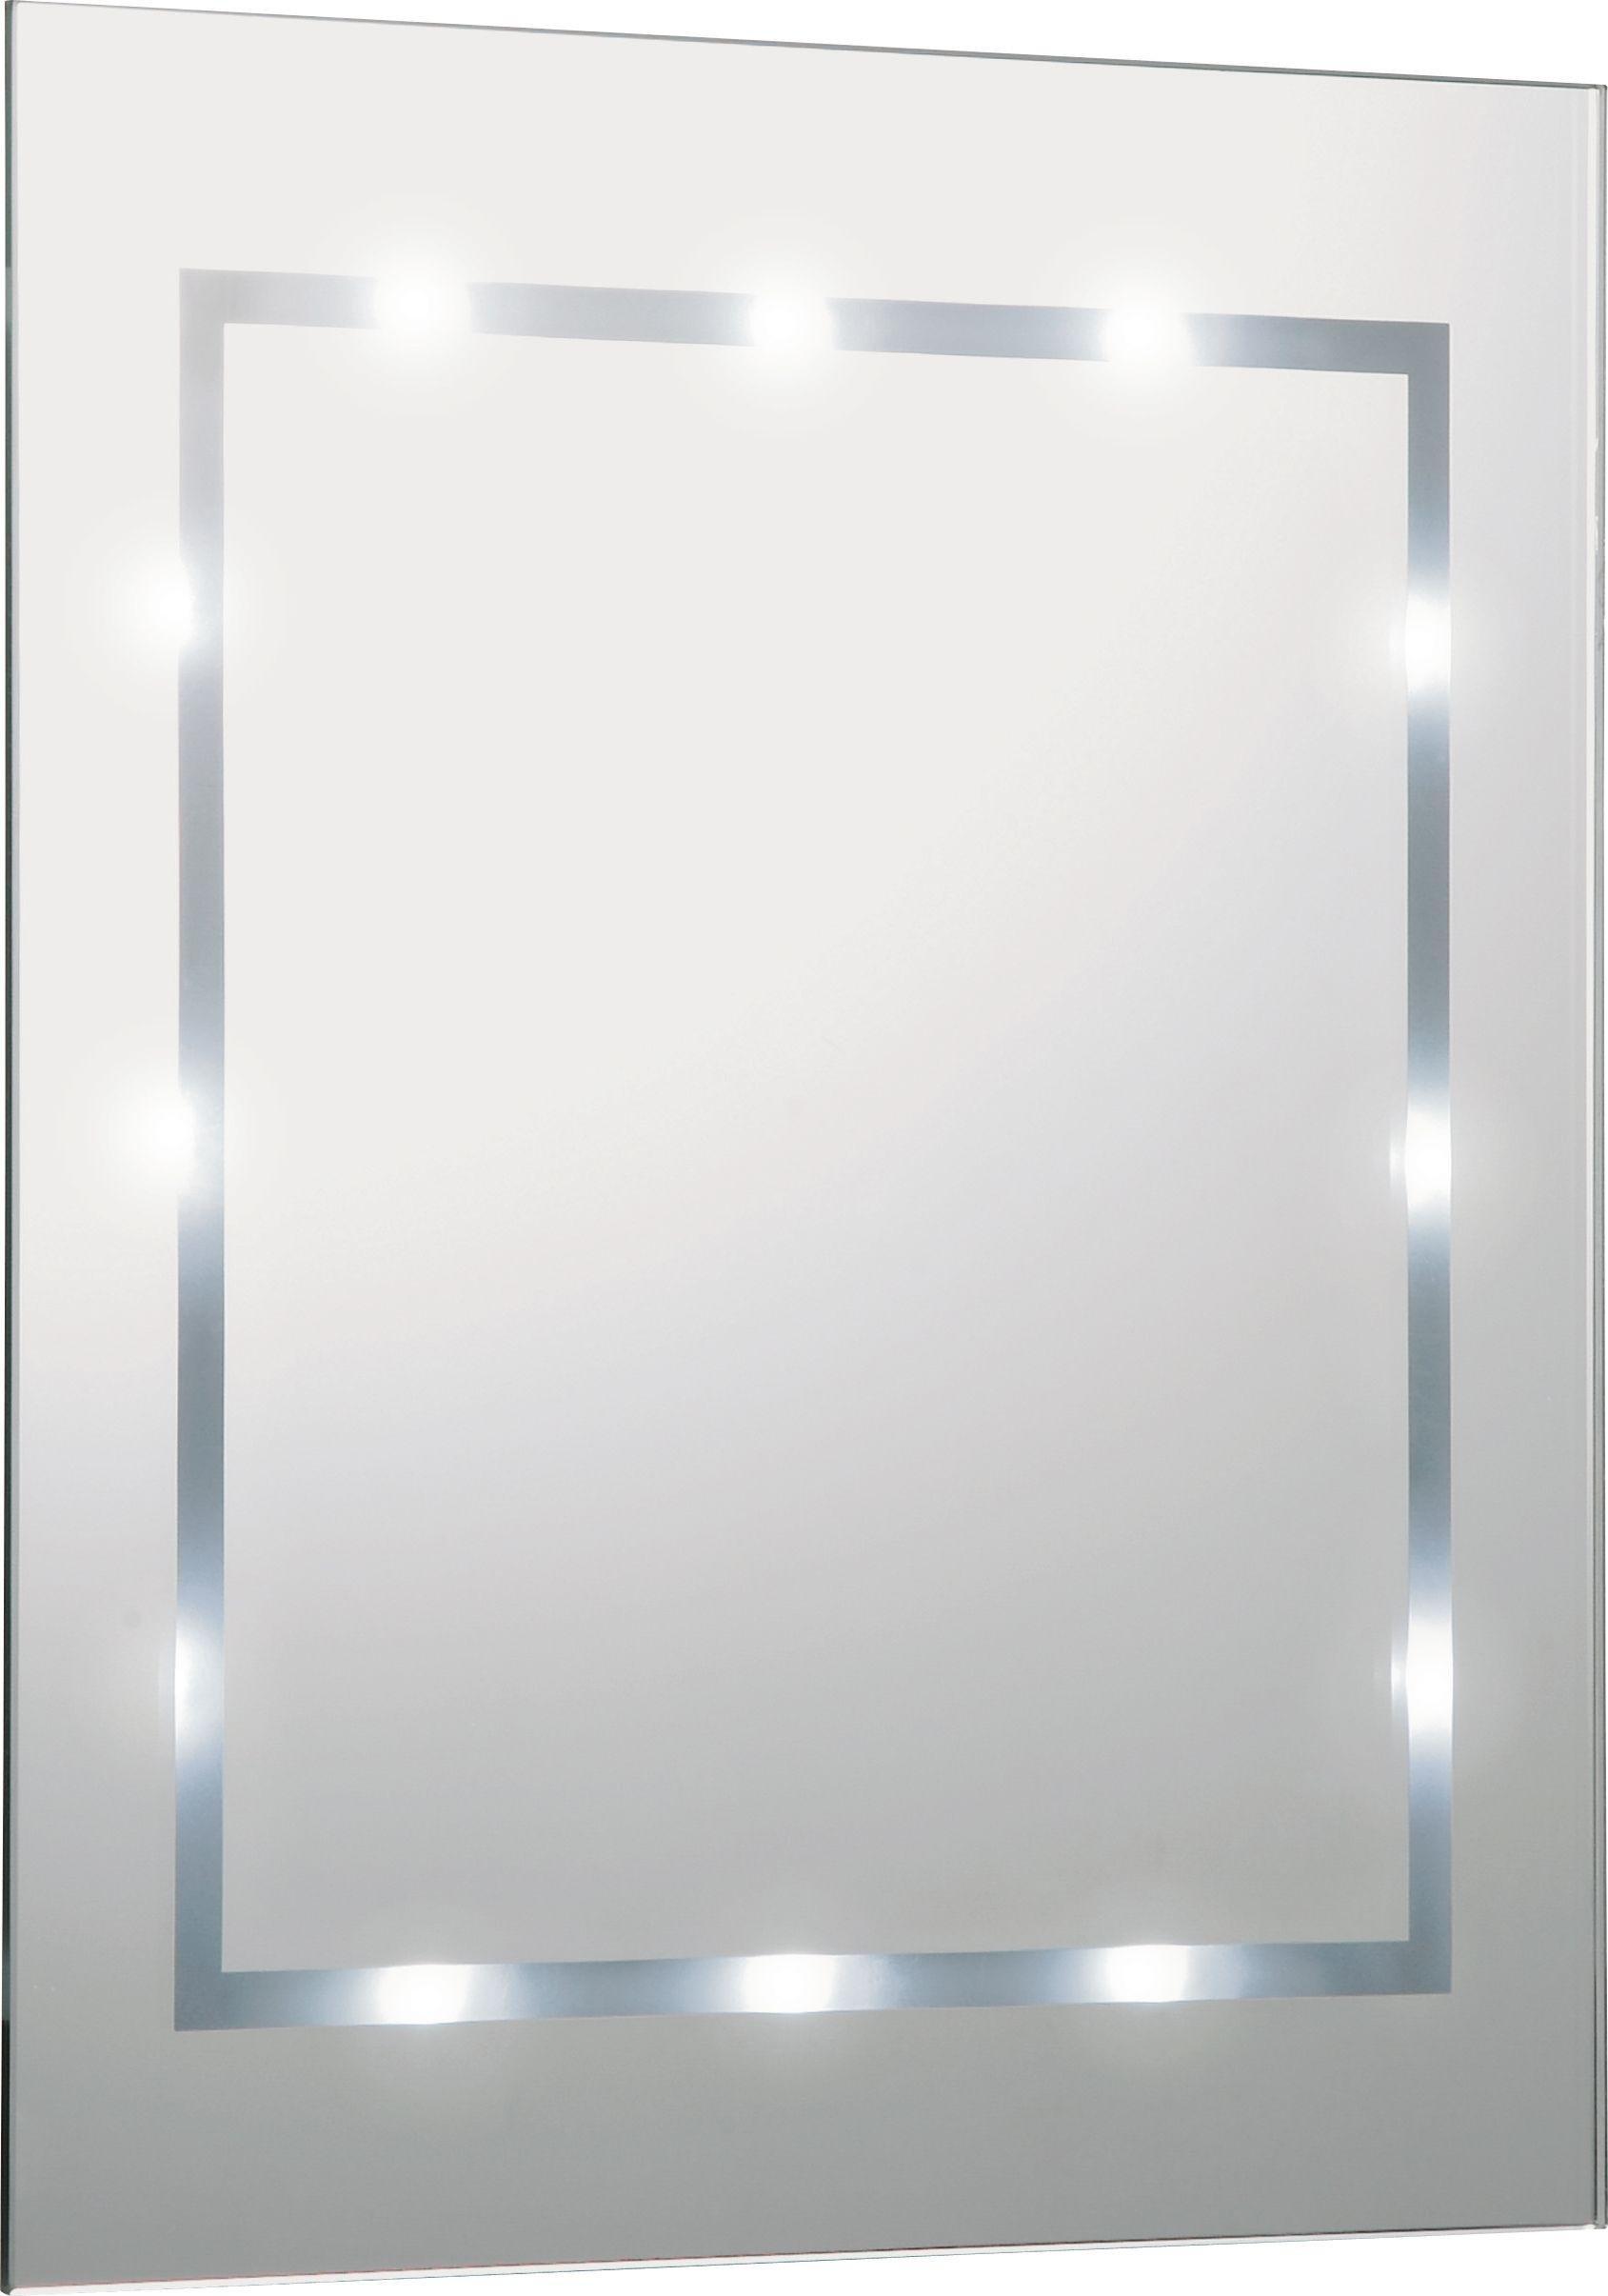 Bathroom Mirrors Illuminated buy home rectangular illuminated bathroom mirror - white gloss at